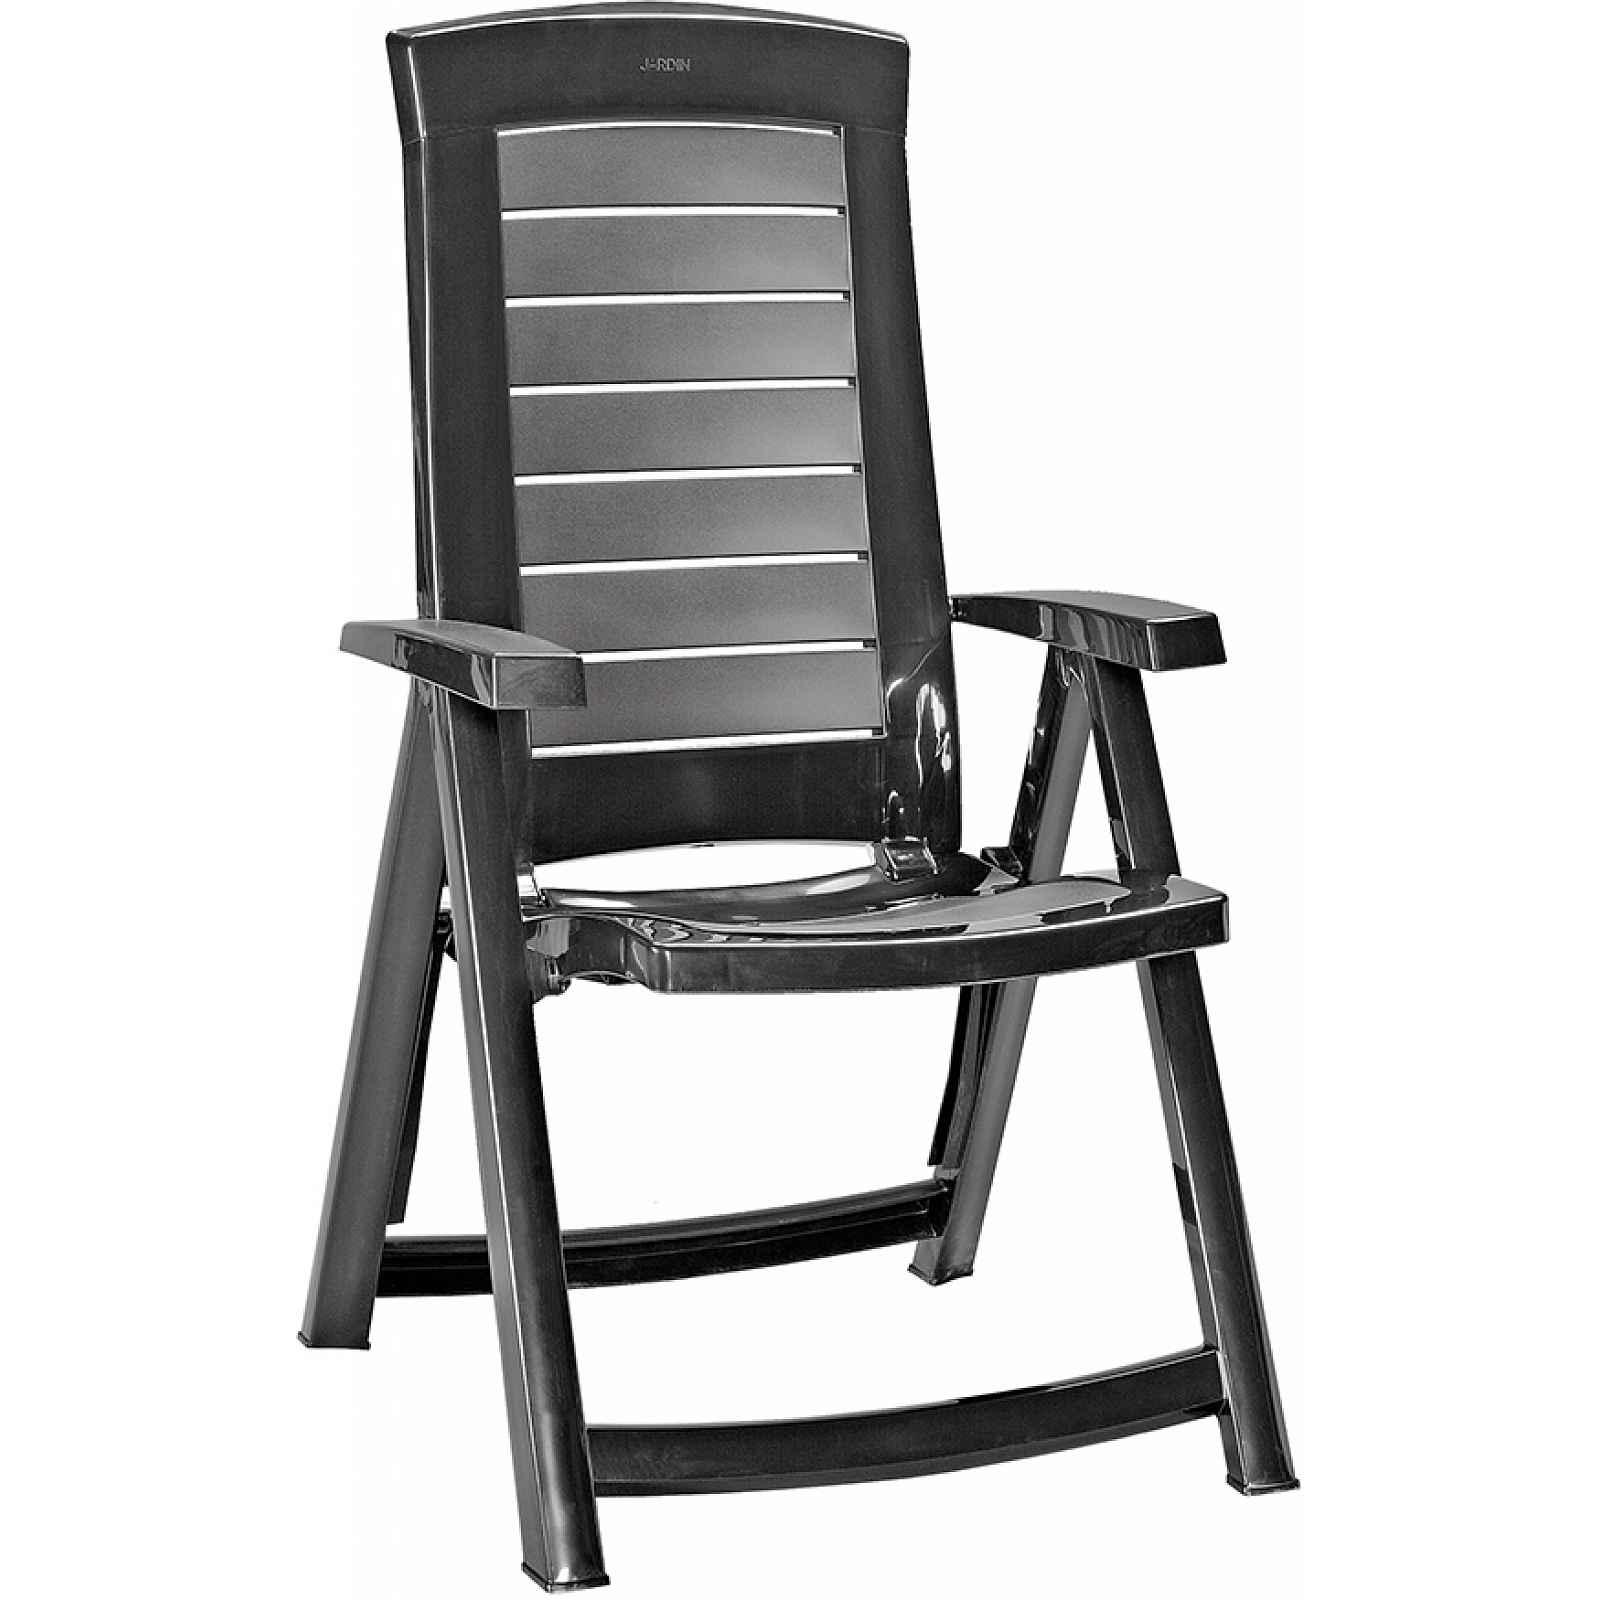 ARUBA polohovací židle - grafit Allibert